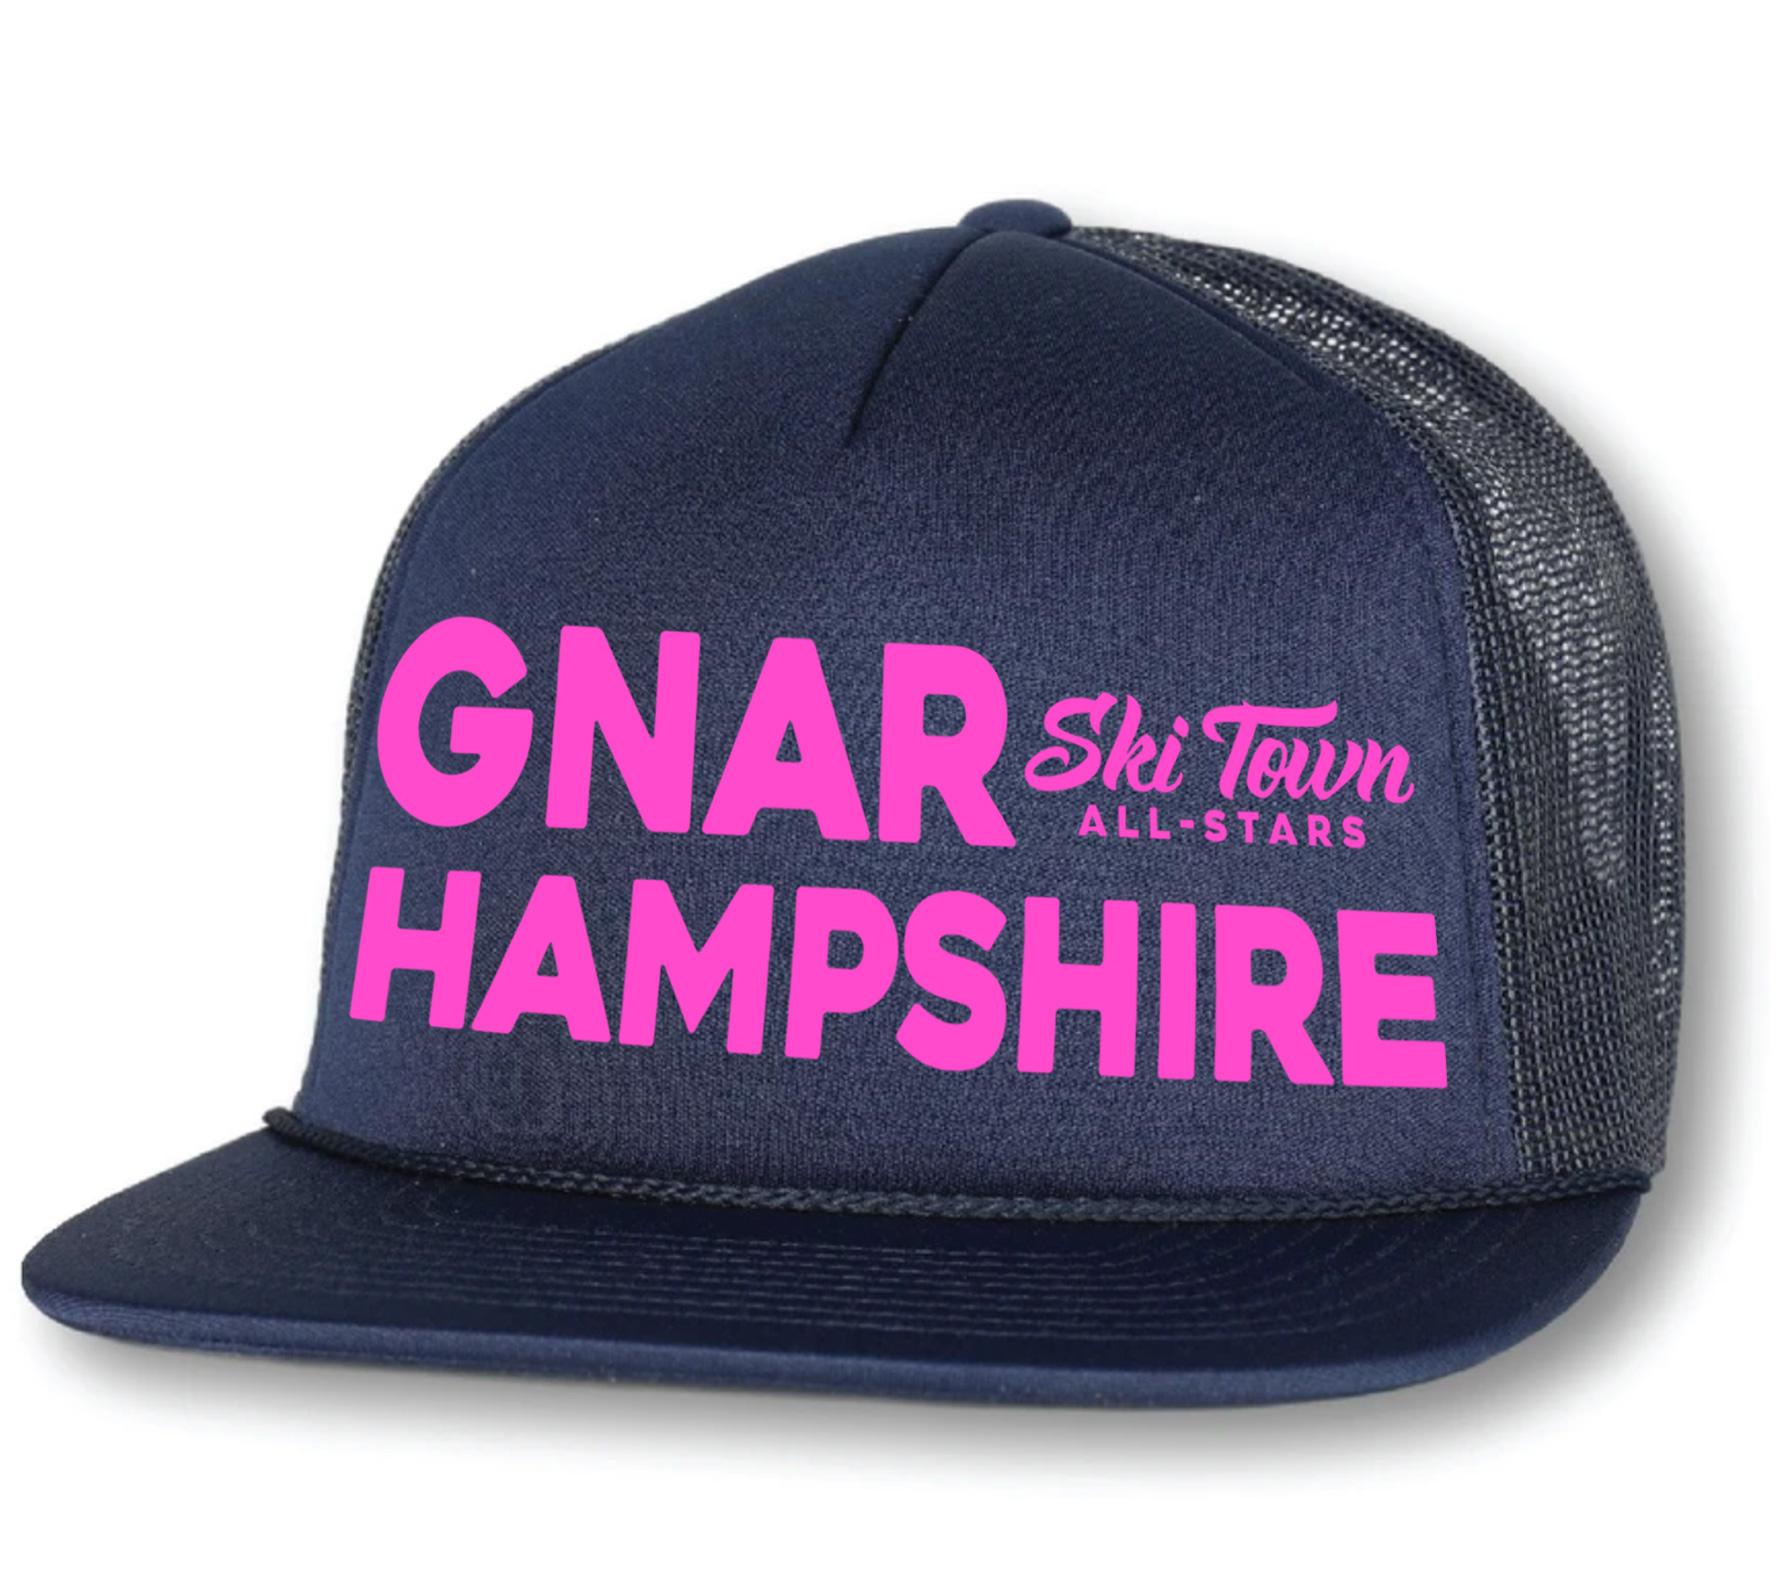 Ski Town All Stars Gnar Hampshire Trucker Hat